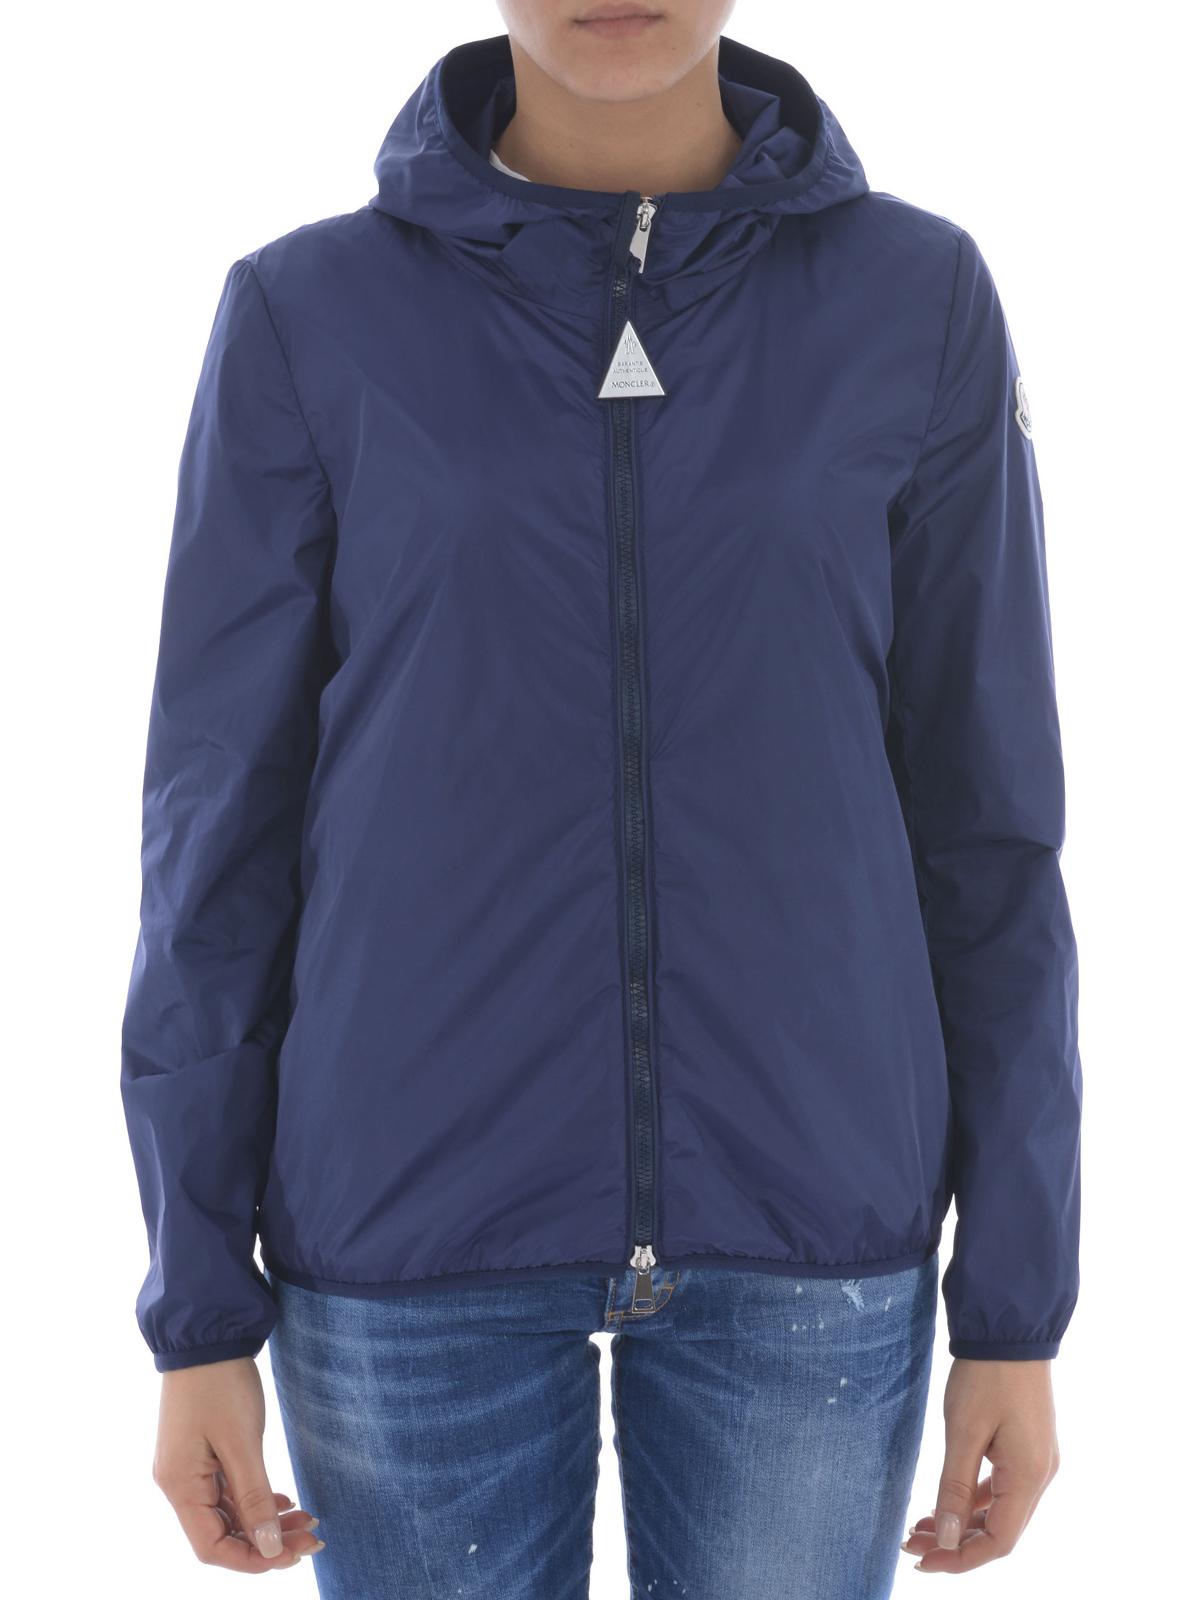 moncler jacket waterproof